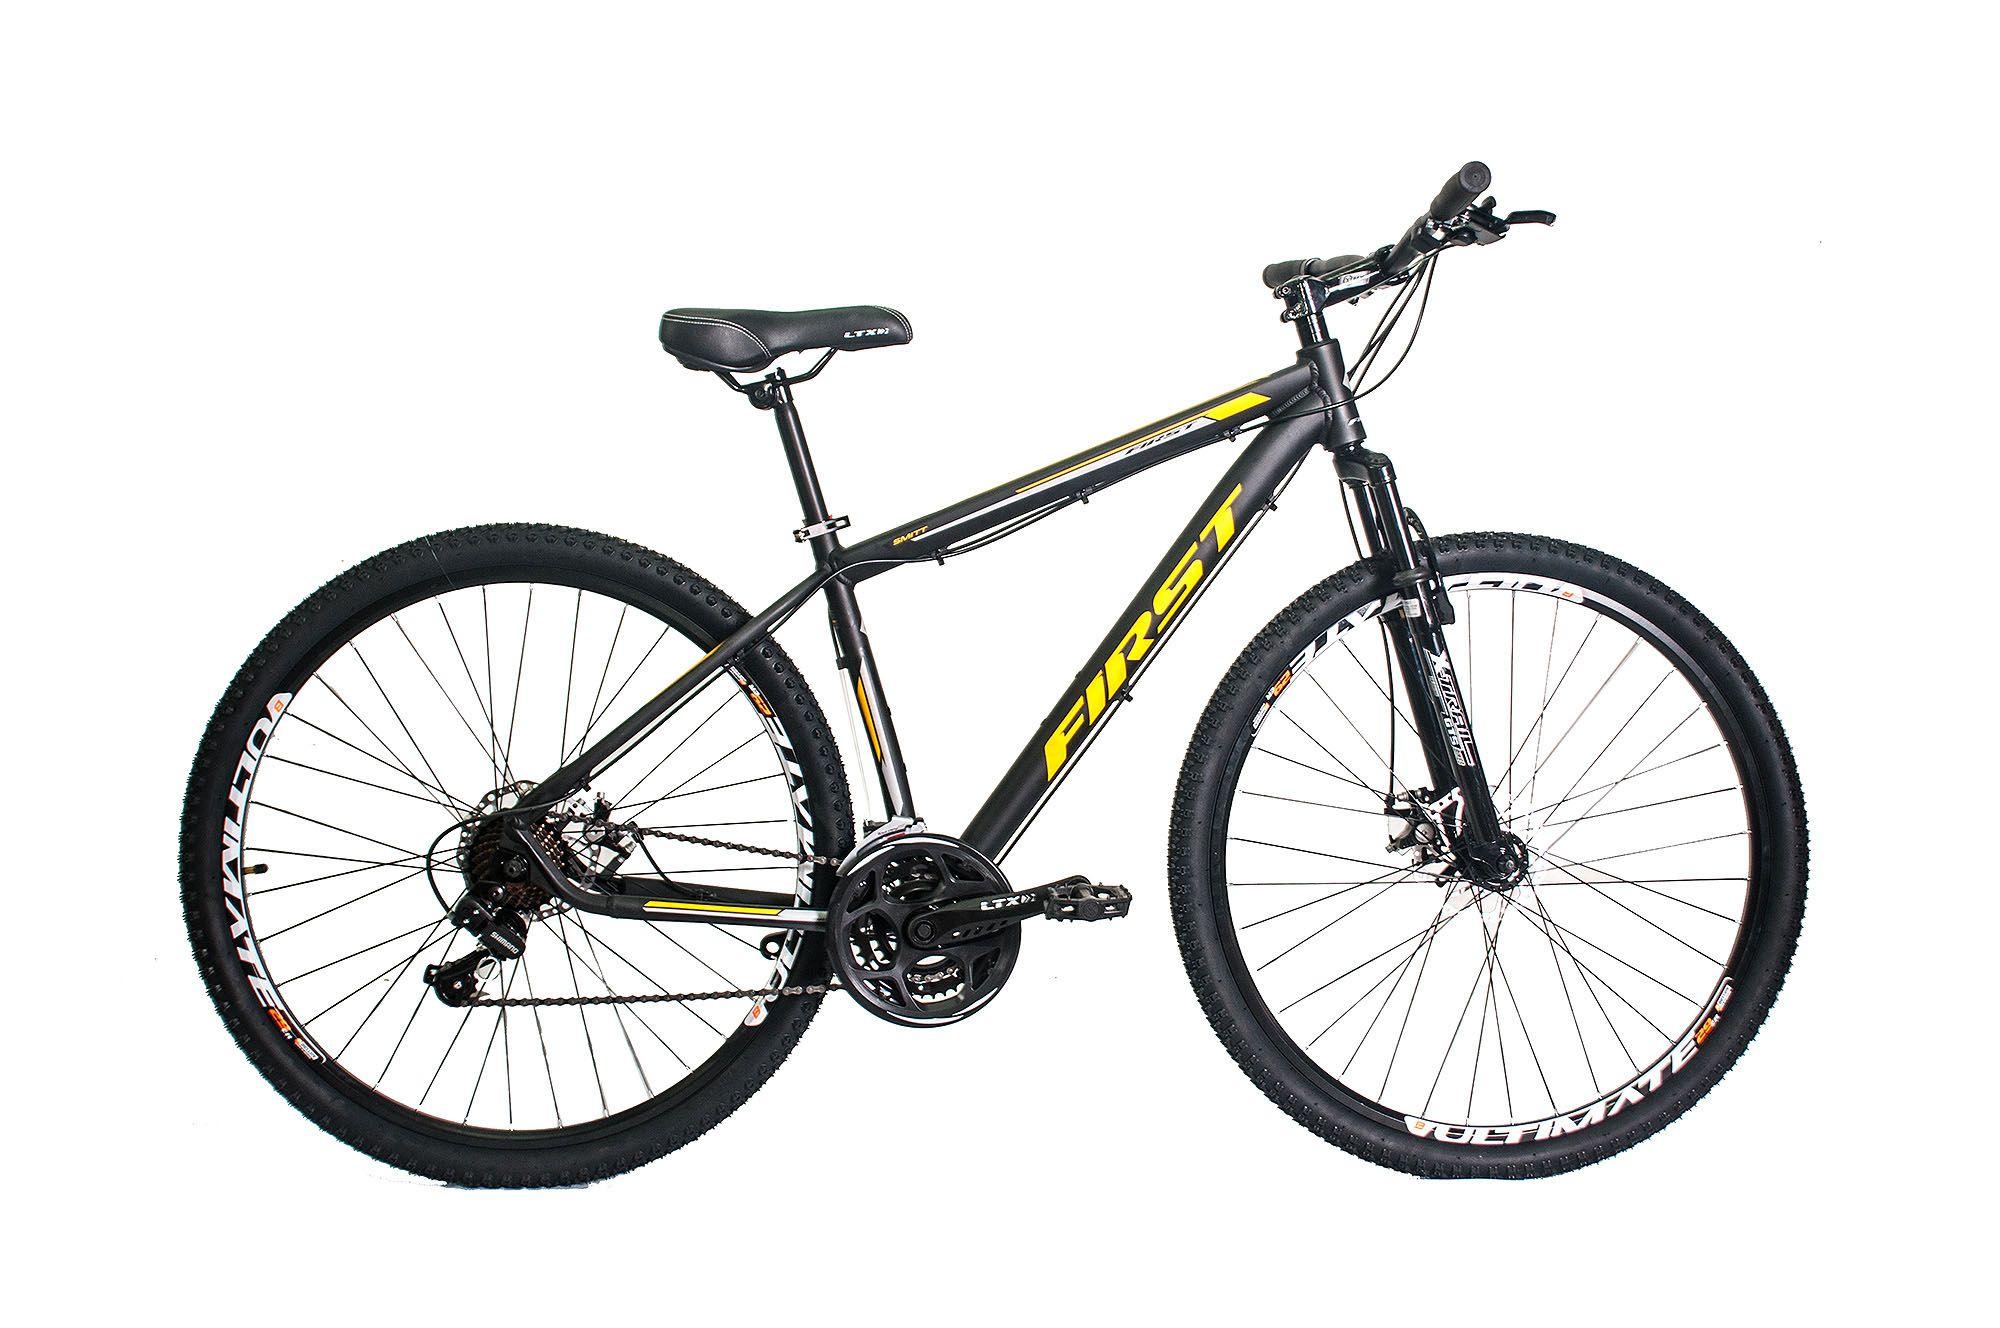 c5637832d Bicicleta 29 FIRST SMITT - câmbios Shimano - freio a disco 24 Marchas -  Extremebike ...